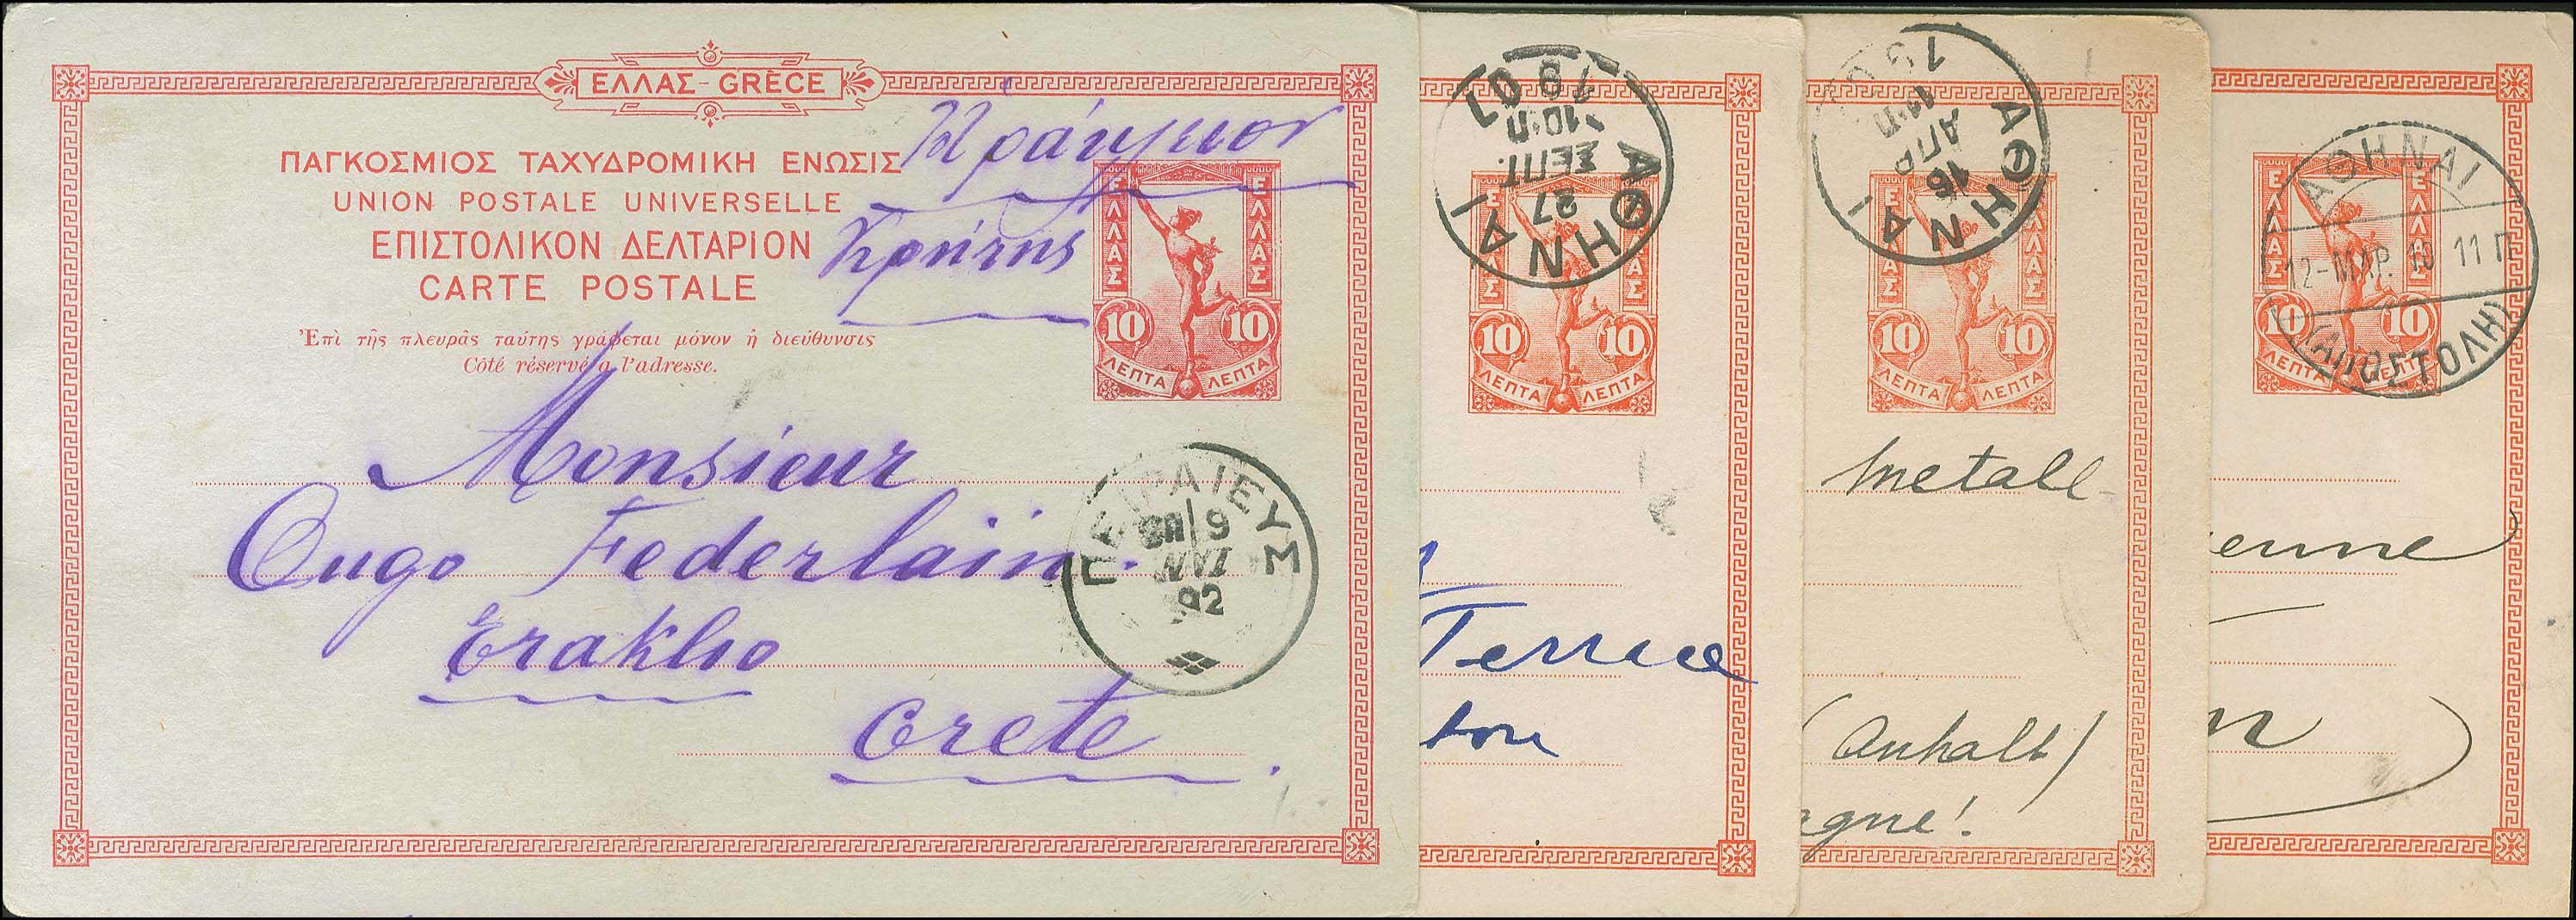 Lot 959 - -  POSTAL STATIONERY Postal stationery -  A. Karamitsos Public Auction 668 General Philatelic Auction